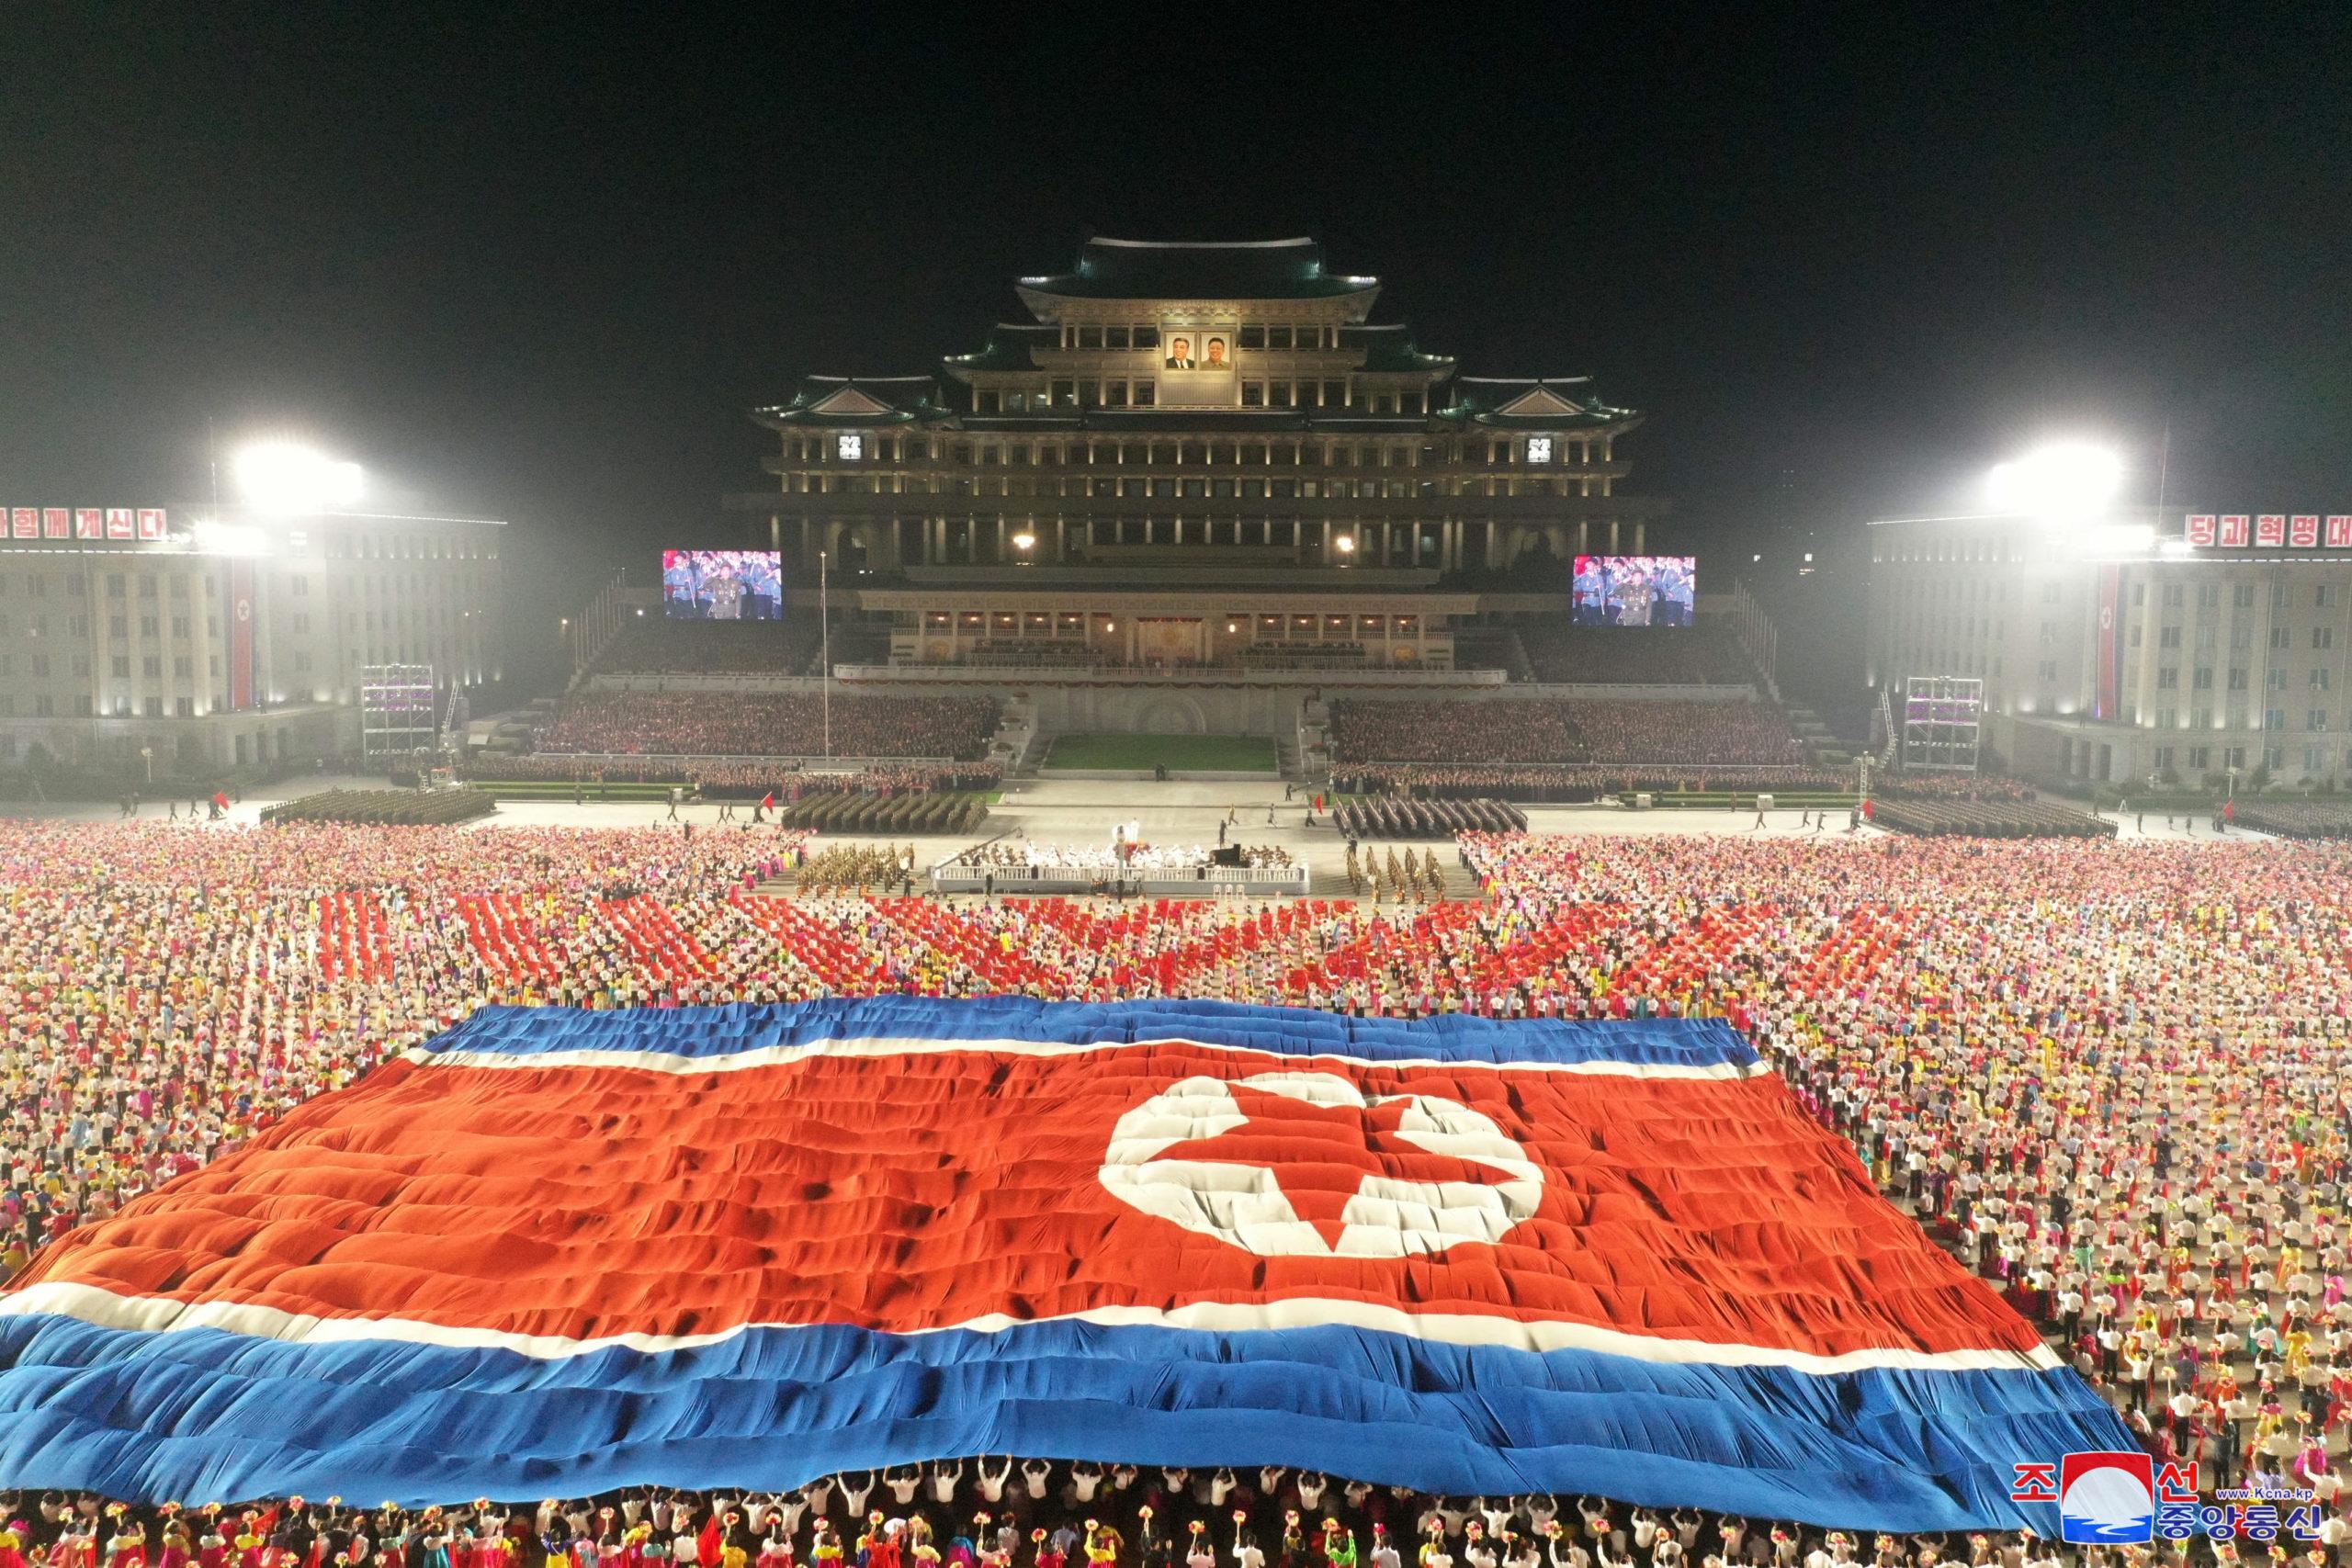 Kim Jong Un Hazmat Suit Army Parade! North Korea